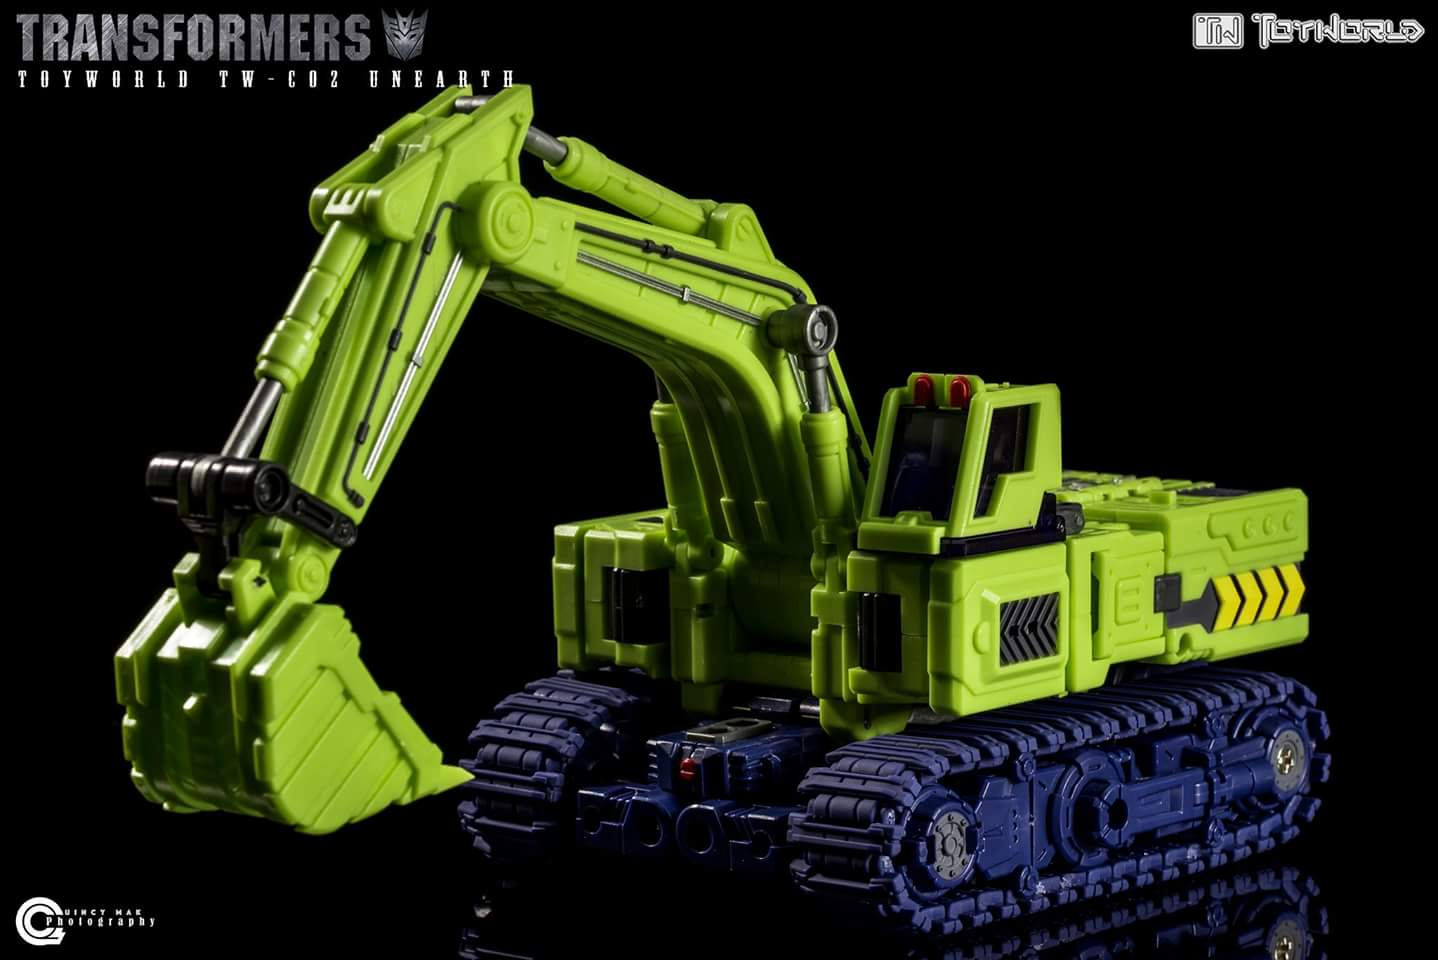 [Toyworld] Produit Tiers - Jouet TW-C Constructor aka Devastator/Dévastateur (Version vert G1 et jaune G2) - Page 4 OxtBBfxb